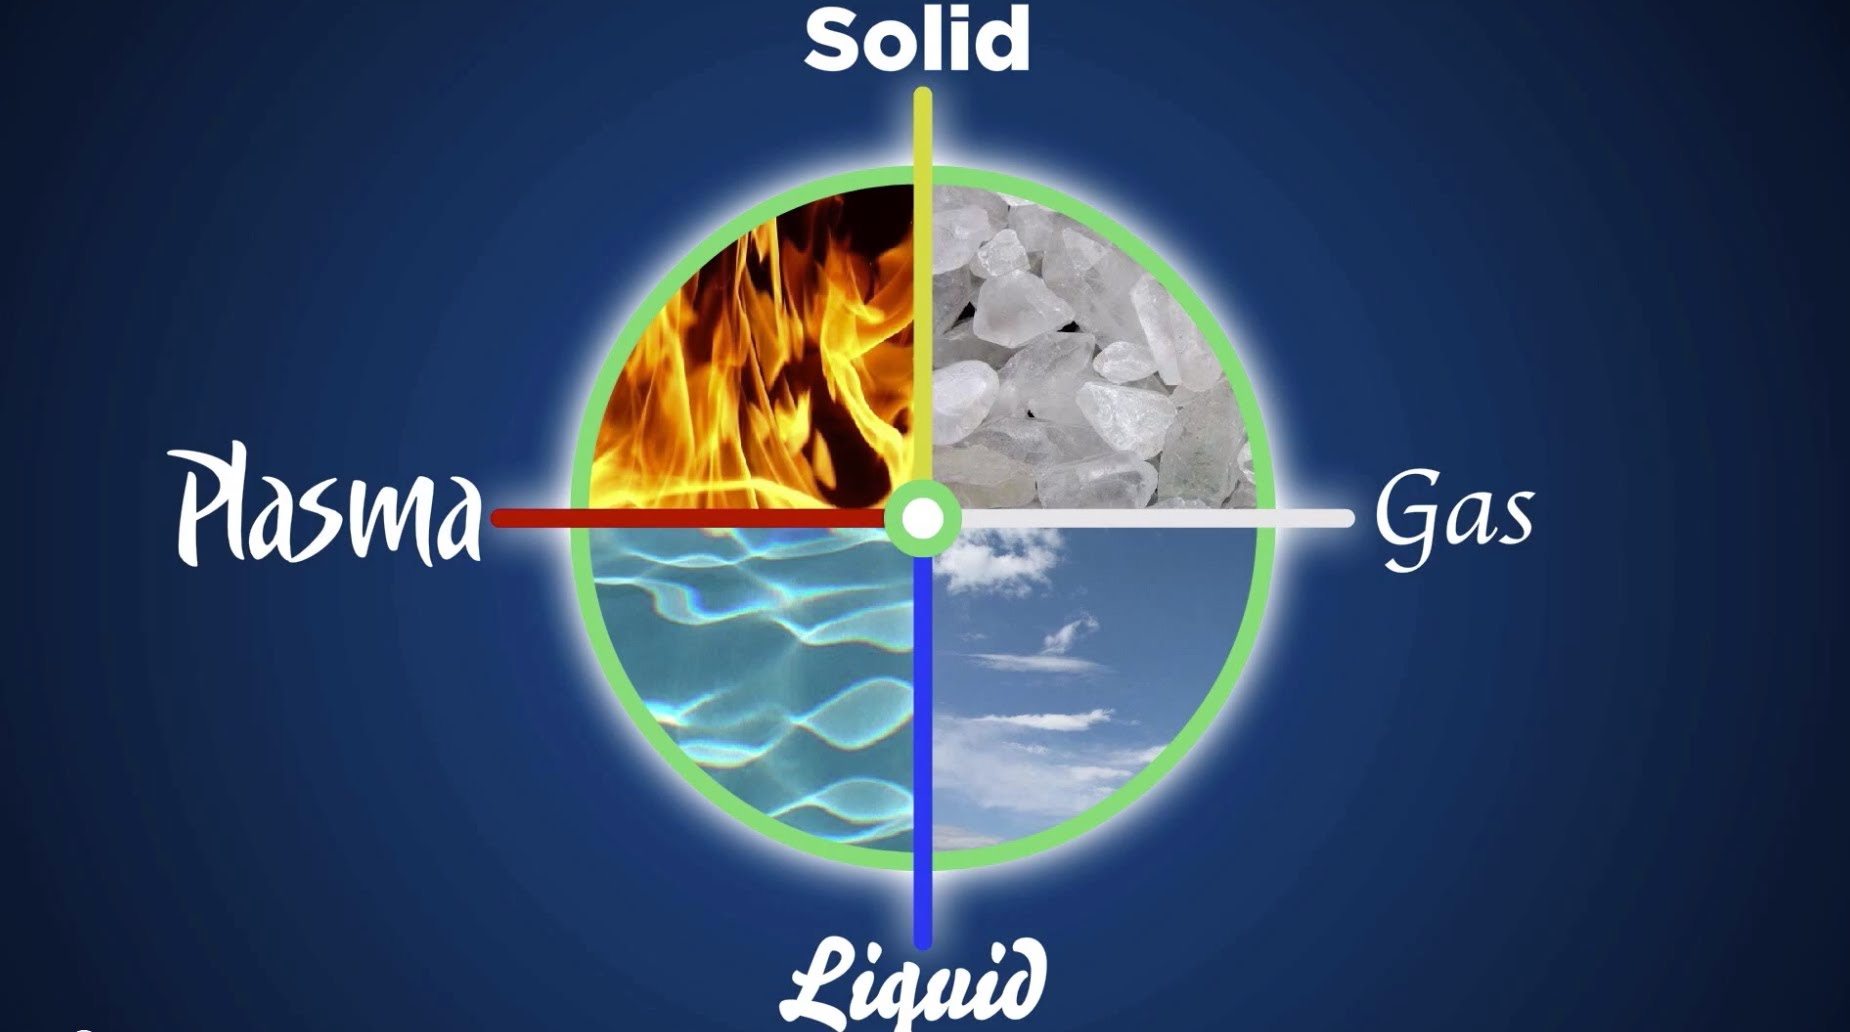 Plasma Solid Gas Liquid Fire Earth Air Water